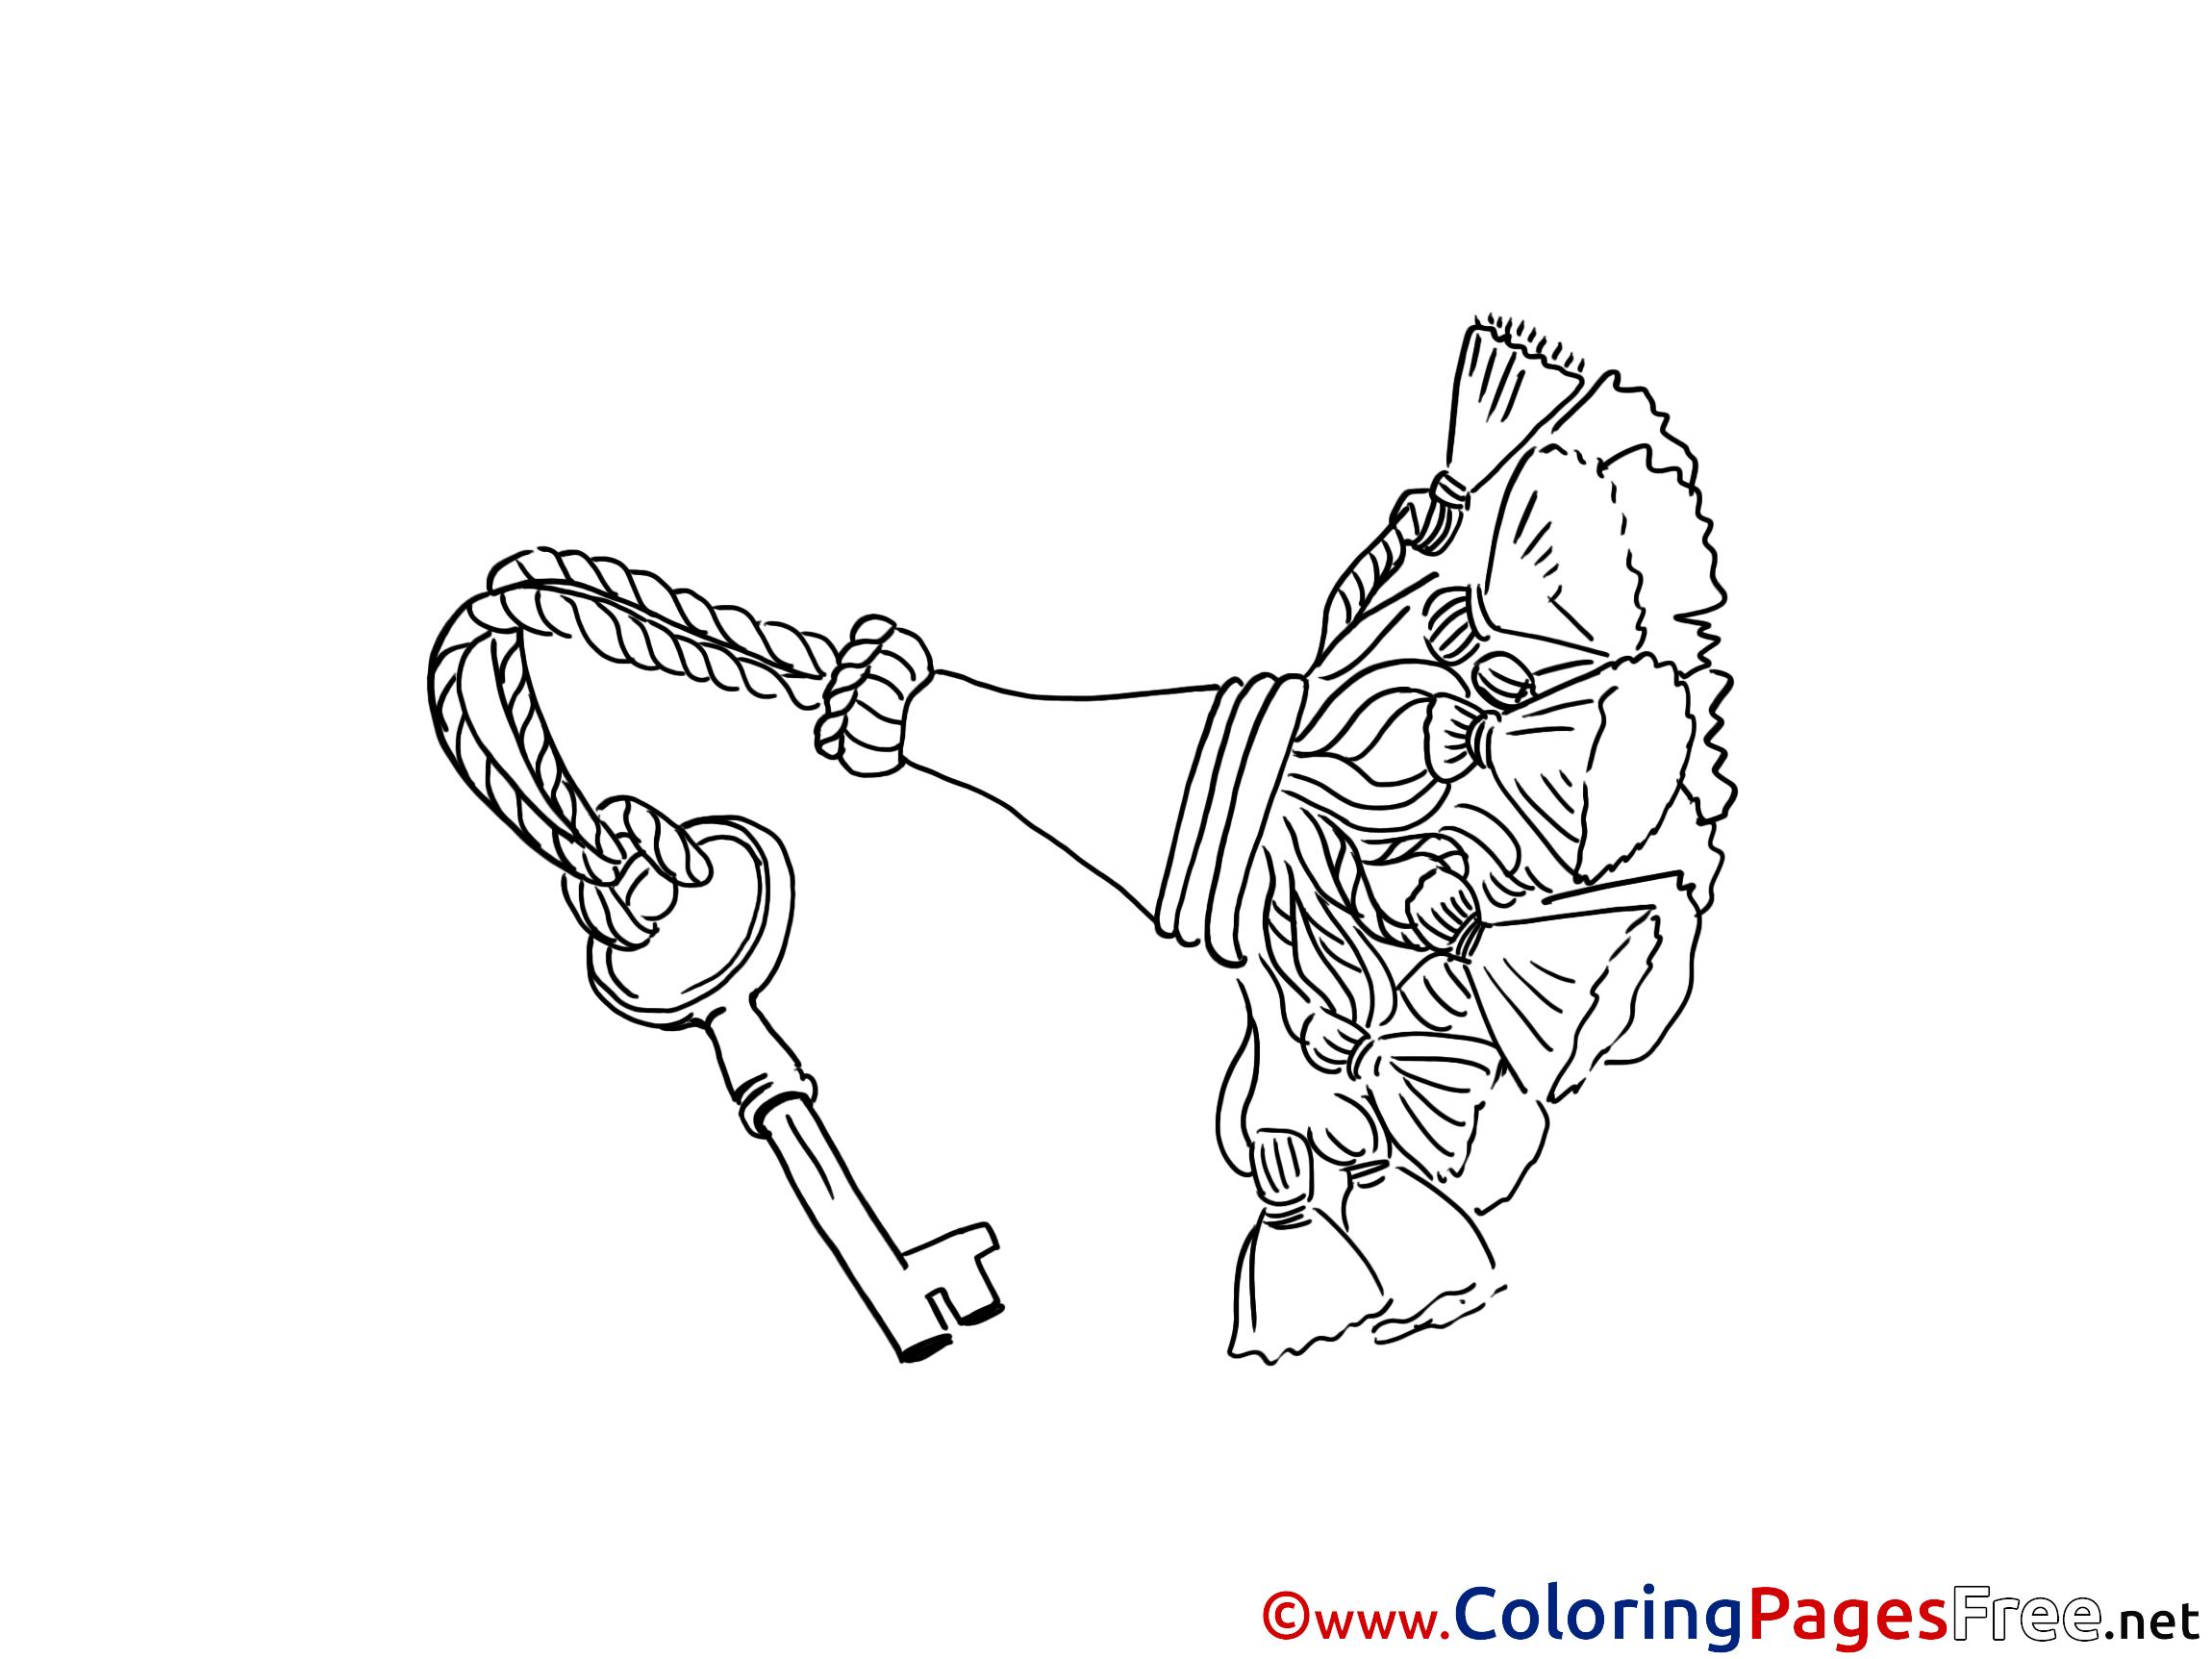 Free coloring page key - Free Coloring Page Key 18